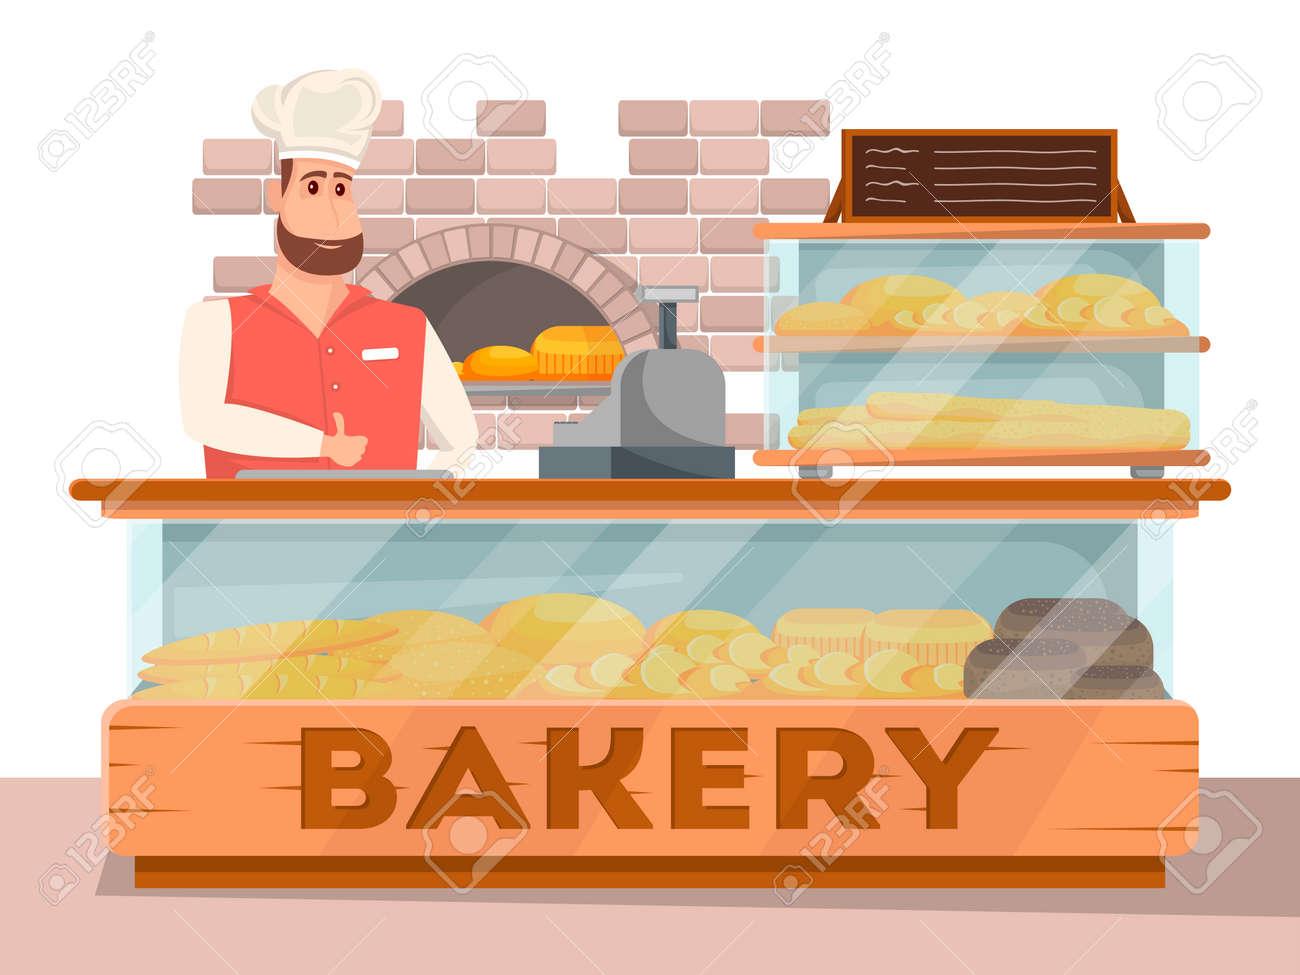 Bakery shop interior banner in cartoon style - 113332933